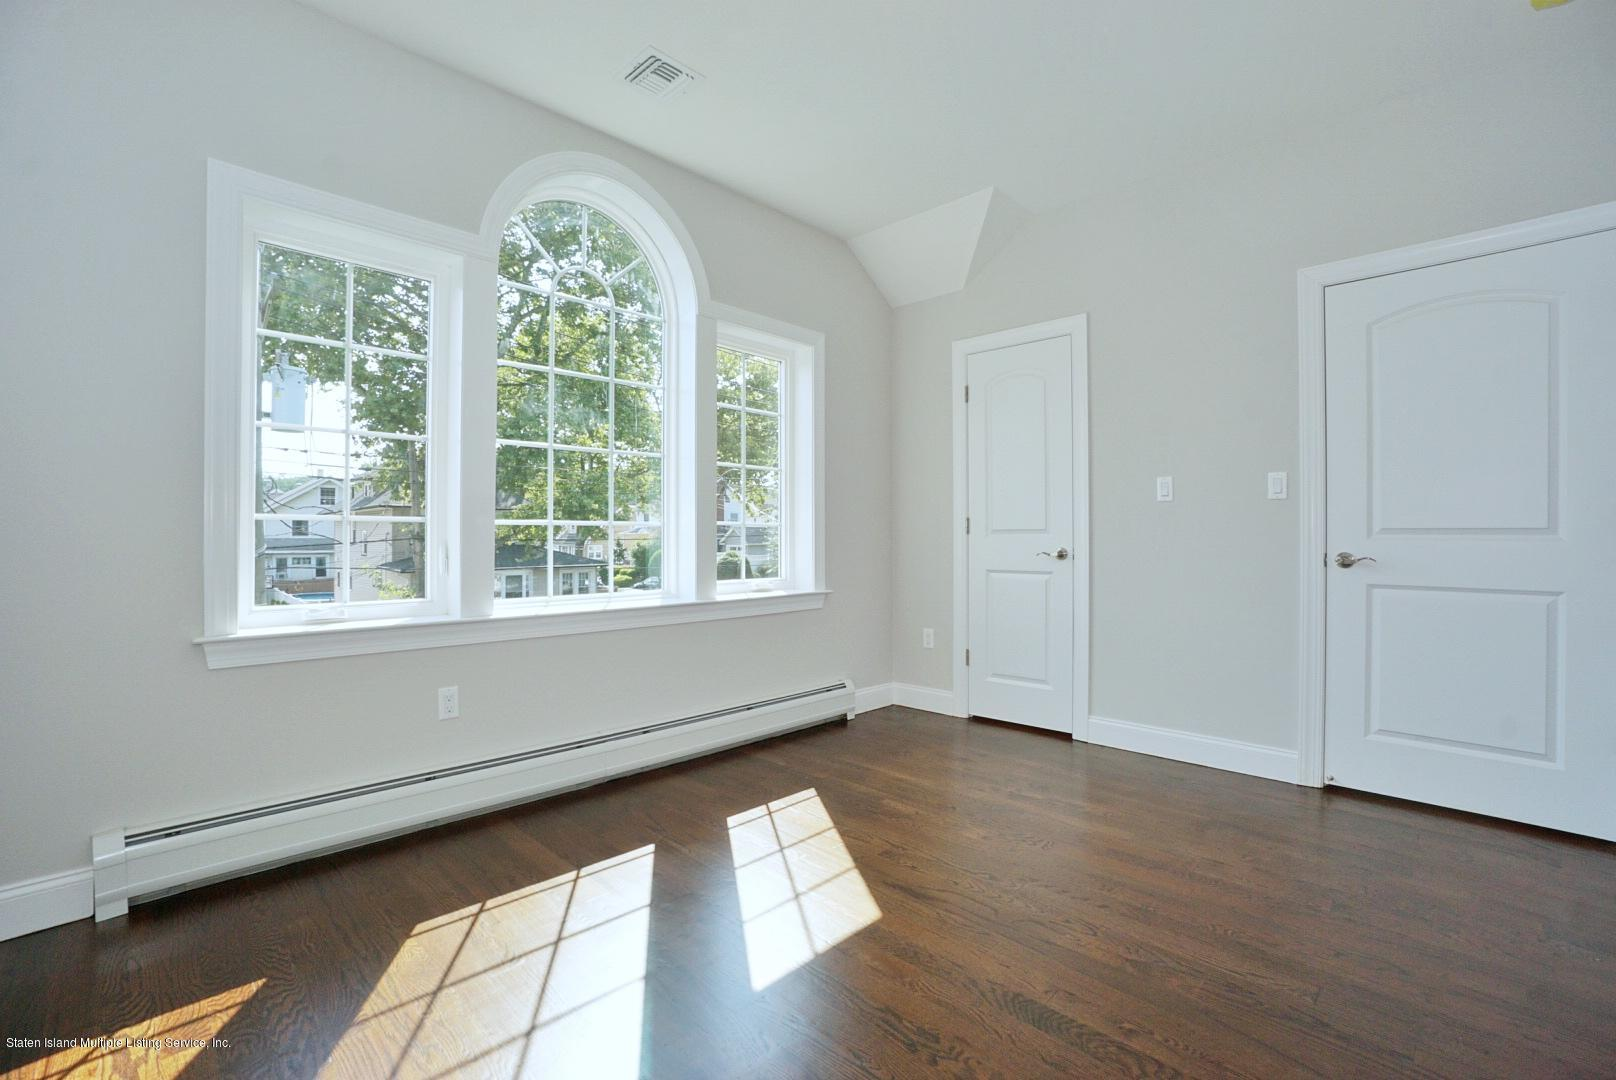 Single Family - Detached 170 Fairview Avenue  Staten Island, NY 10314, MLS-1126684-51